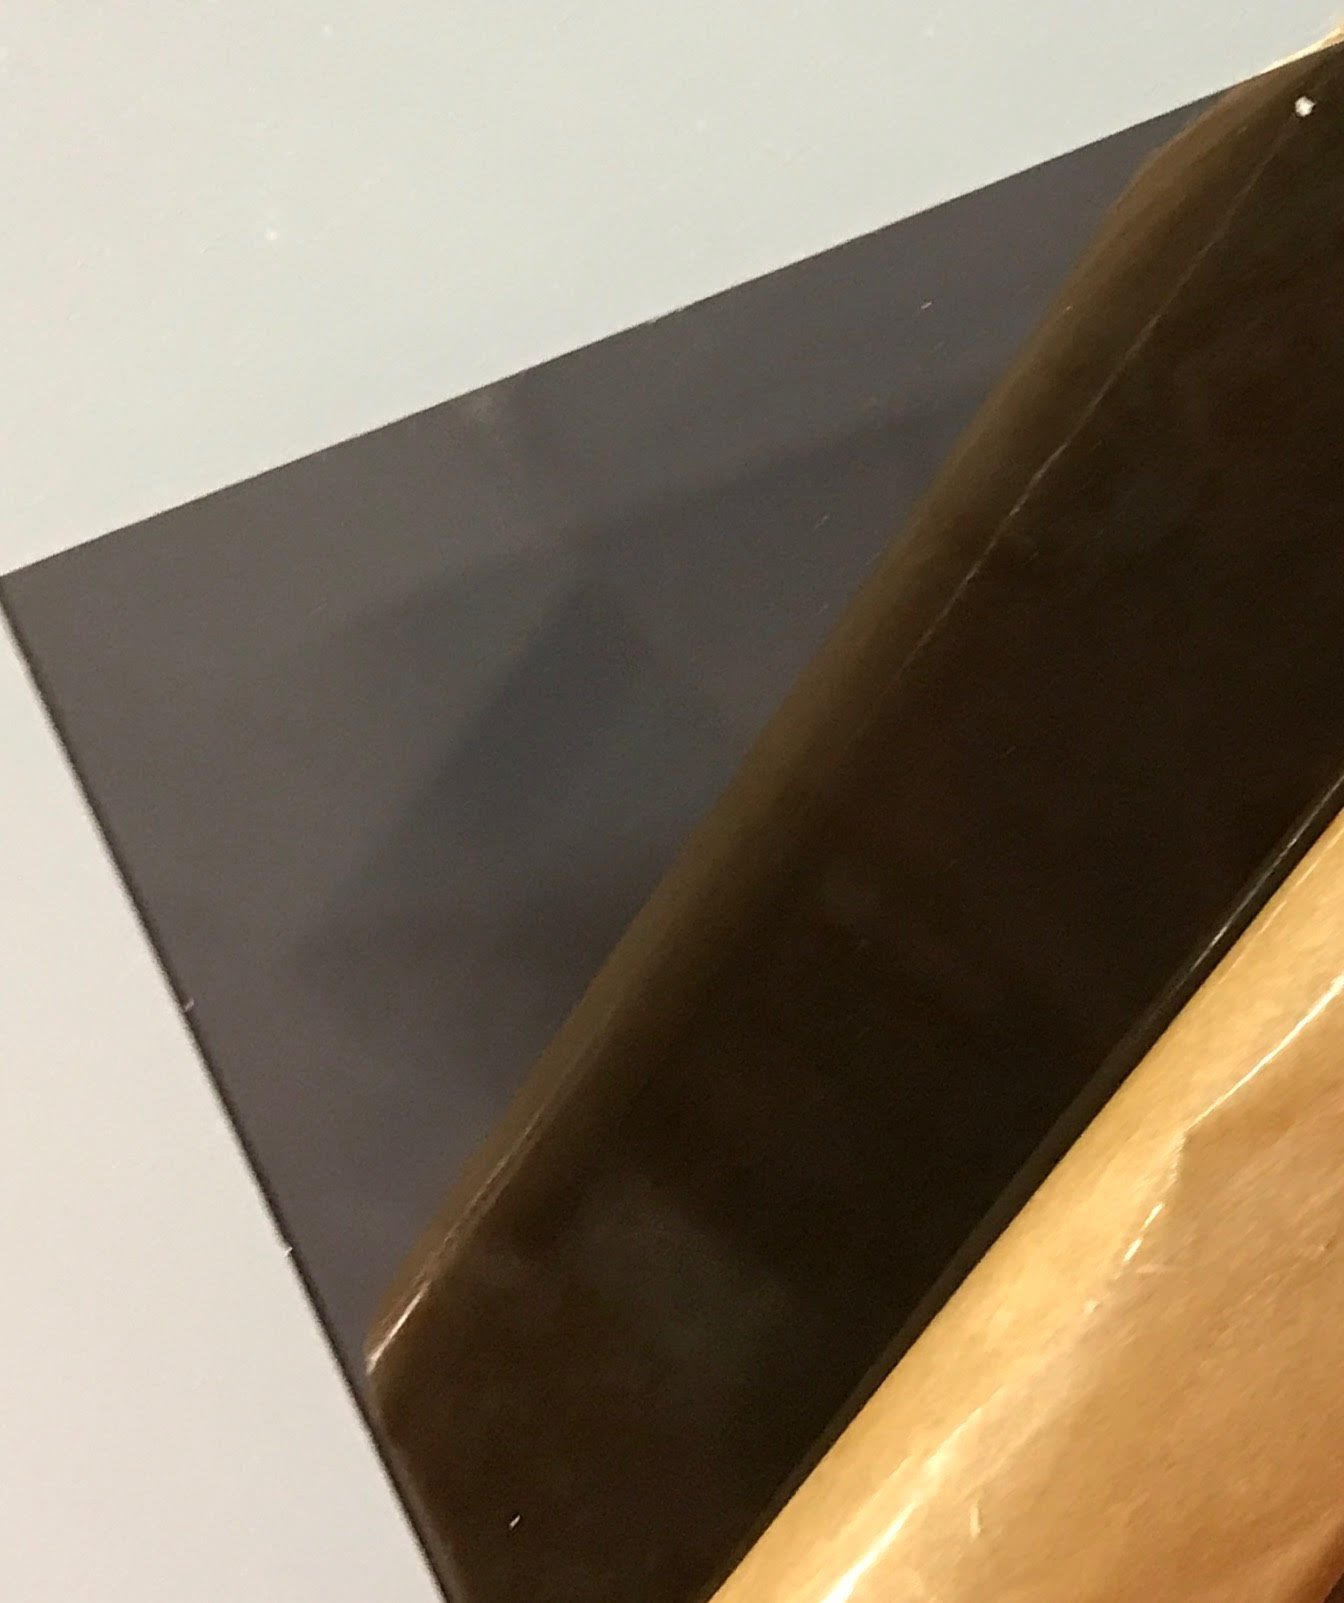 "SIBE-R PLASTIC SUPPLY - Dark Gray/Smoke Transparent Acrylic Plexiglass #2074 - 1/8"" - 24"" x 48"" ACRYLIC PLASTIC SHEET"